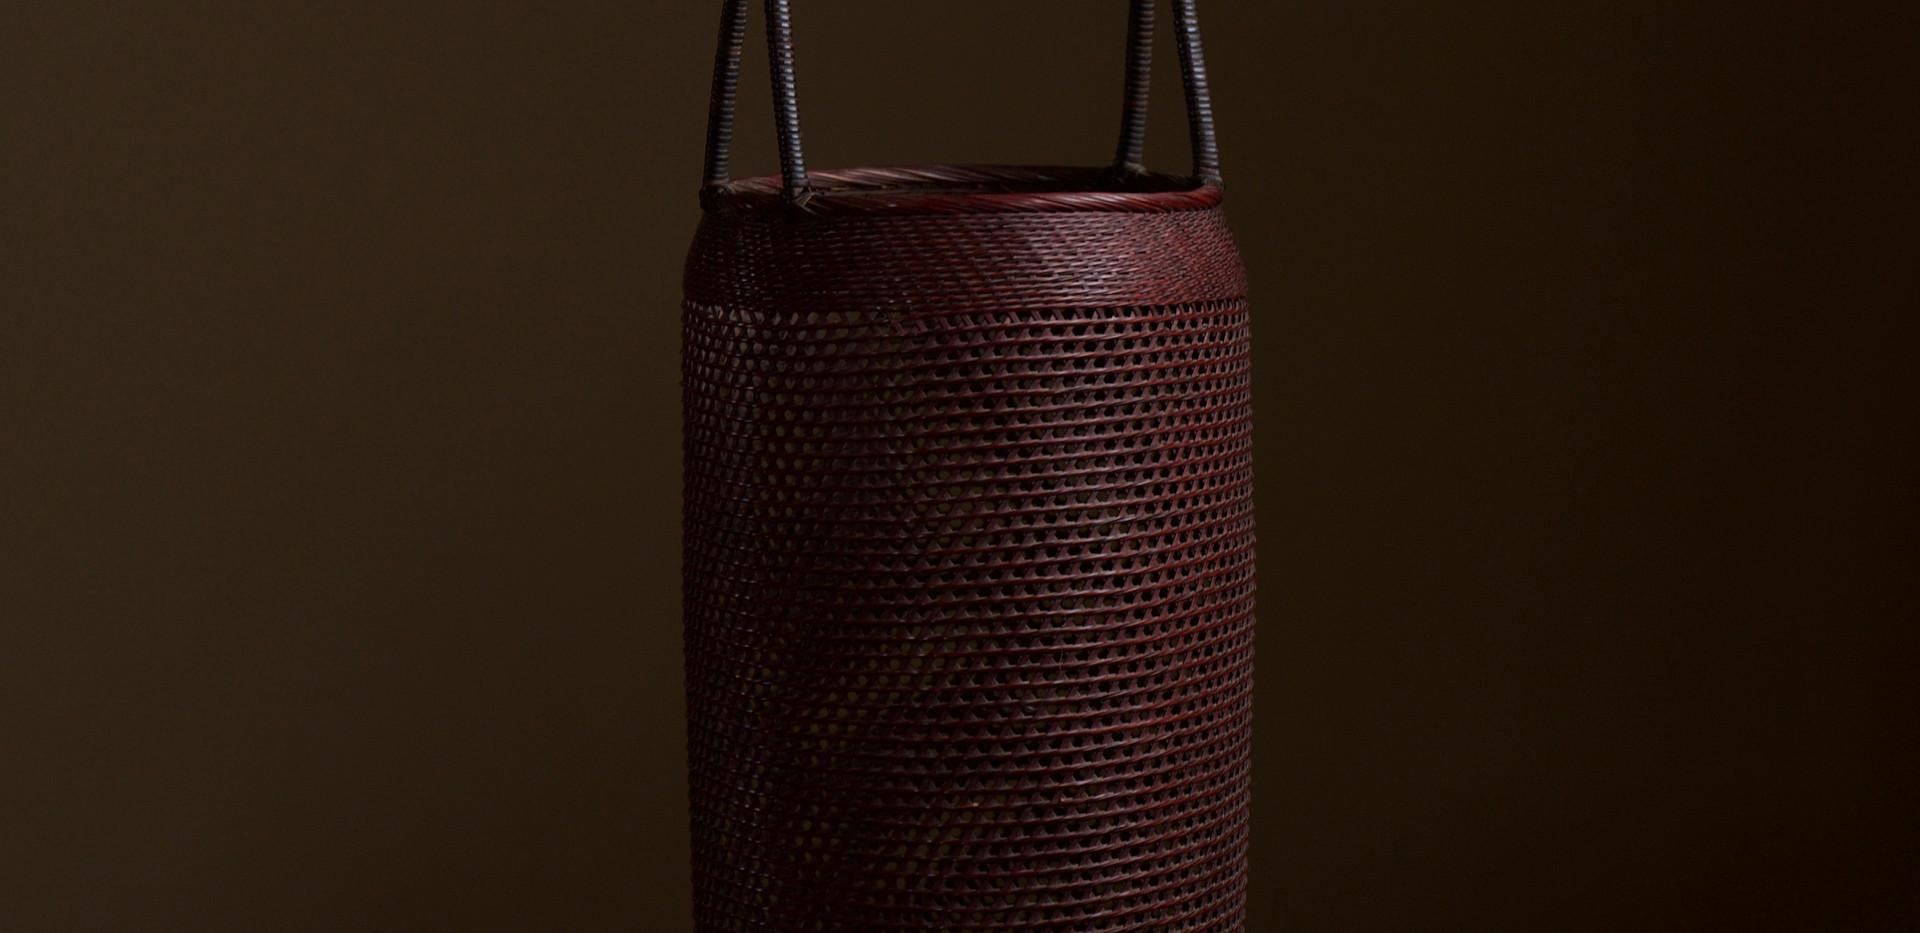 Small Bamboo Flower Basket by Morita Chikuyosai 02.jpg